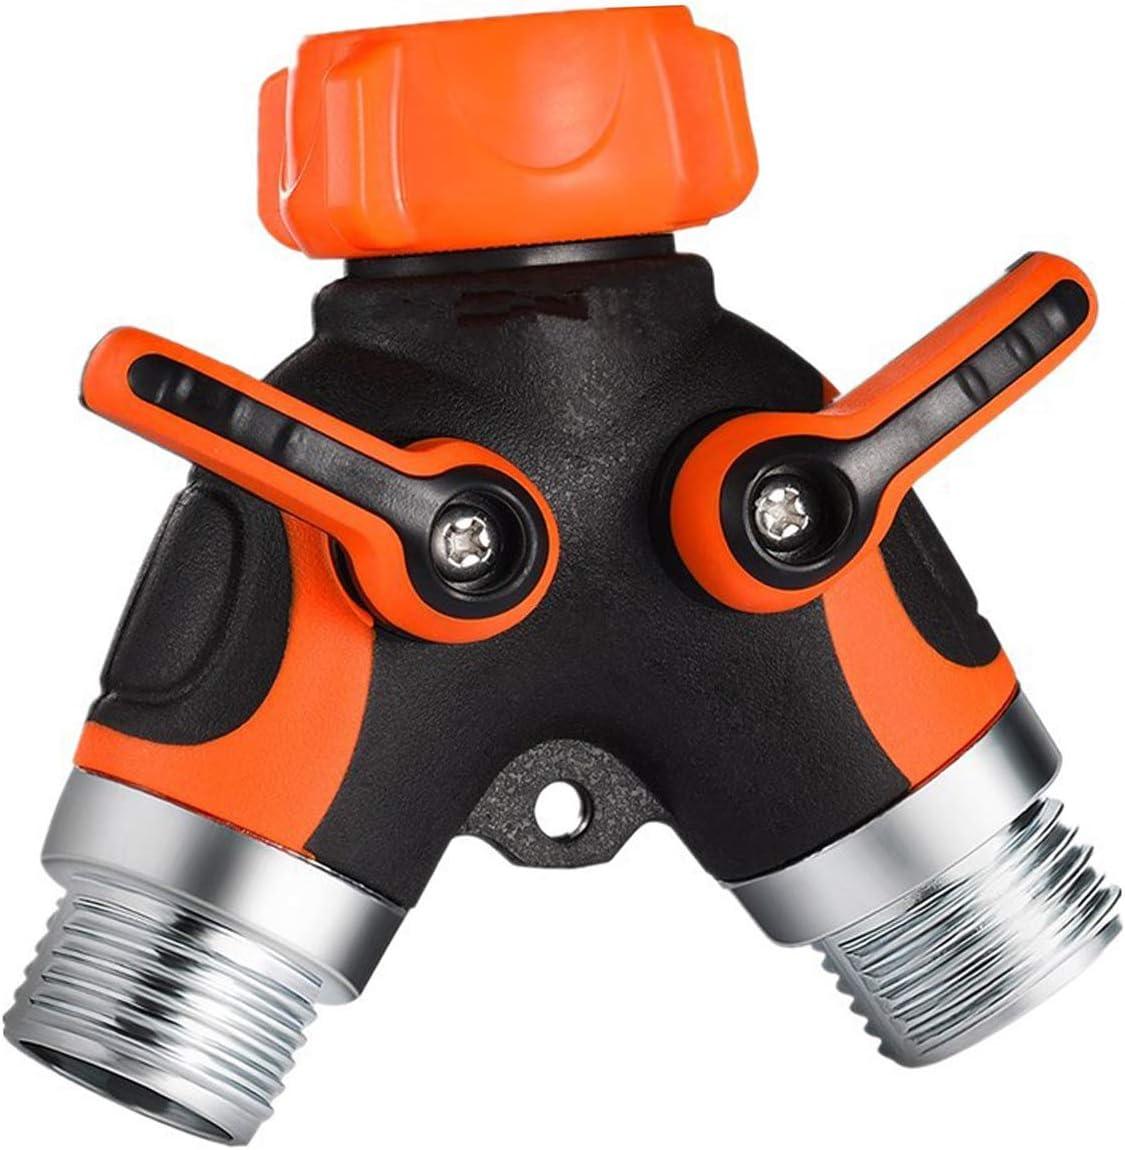 Gardguard Garden Hose Splitter - Y Hose Connector with Rubberized Grip, Easy to Open Valves Garden Hose Splitter, Easy Grip